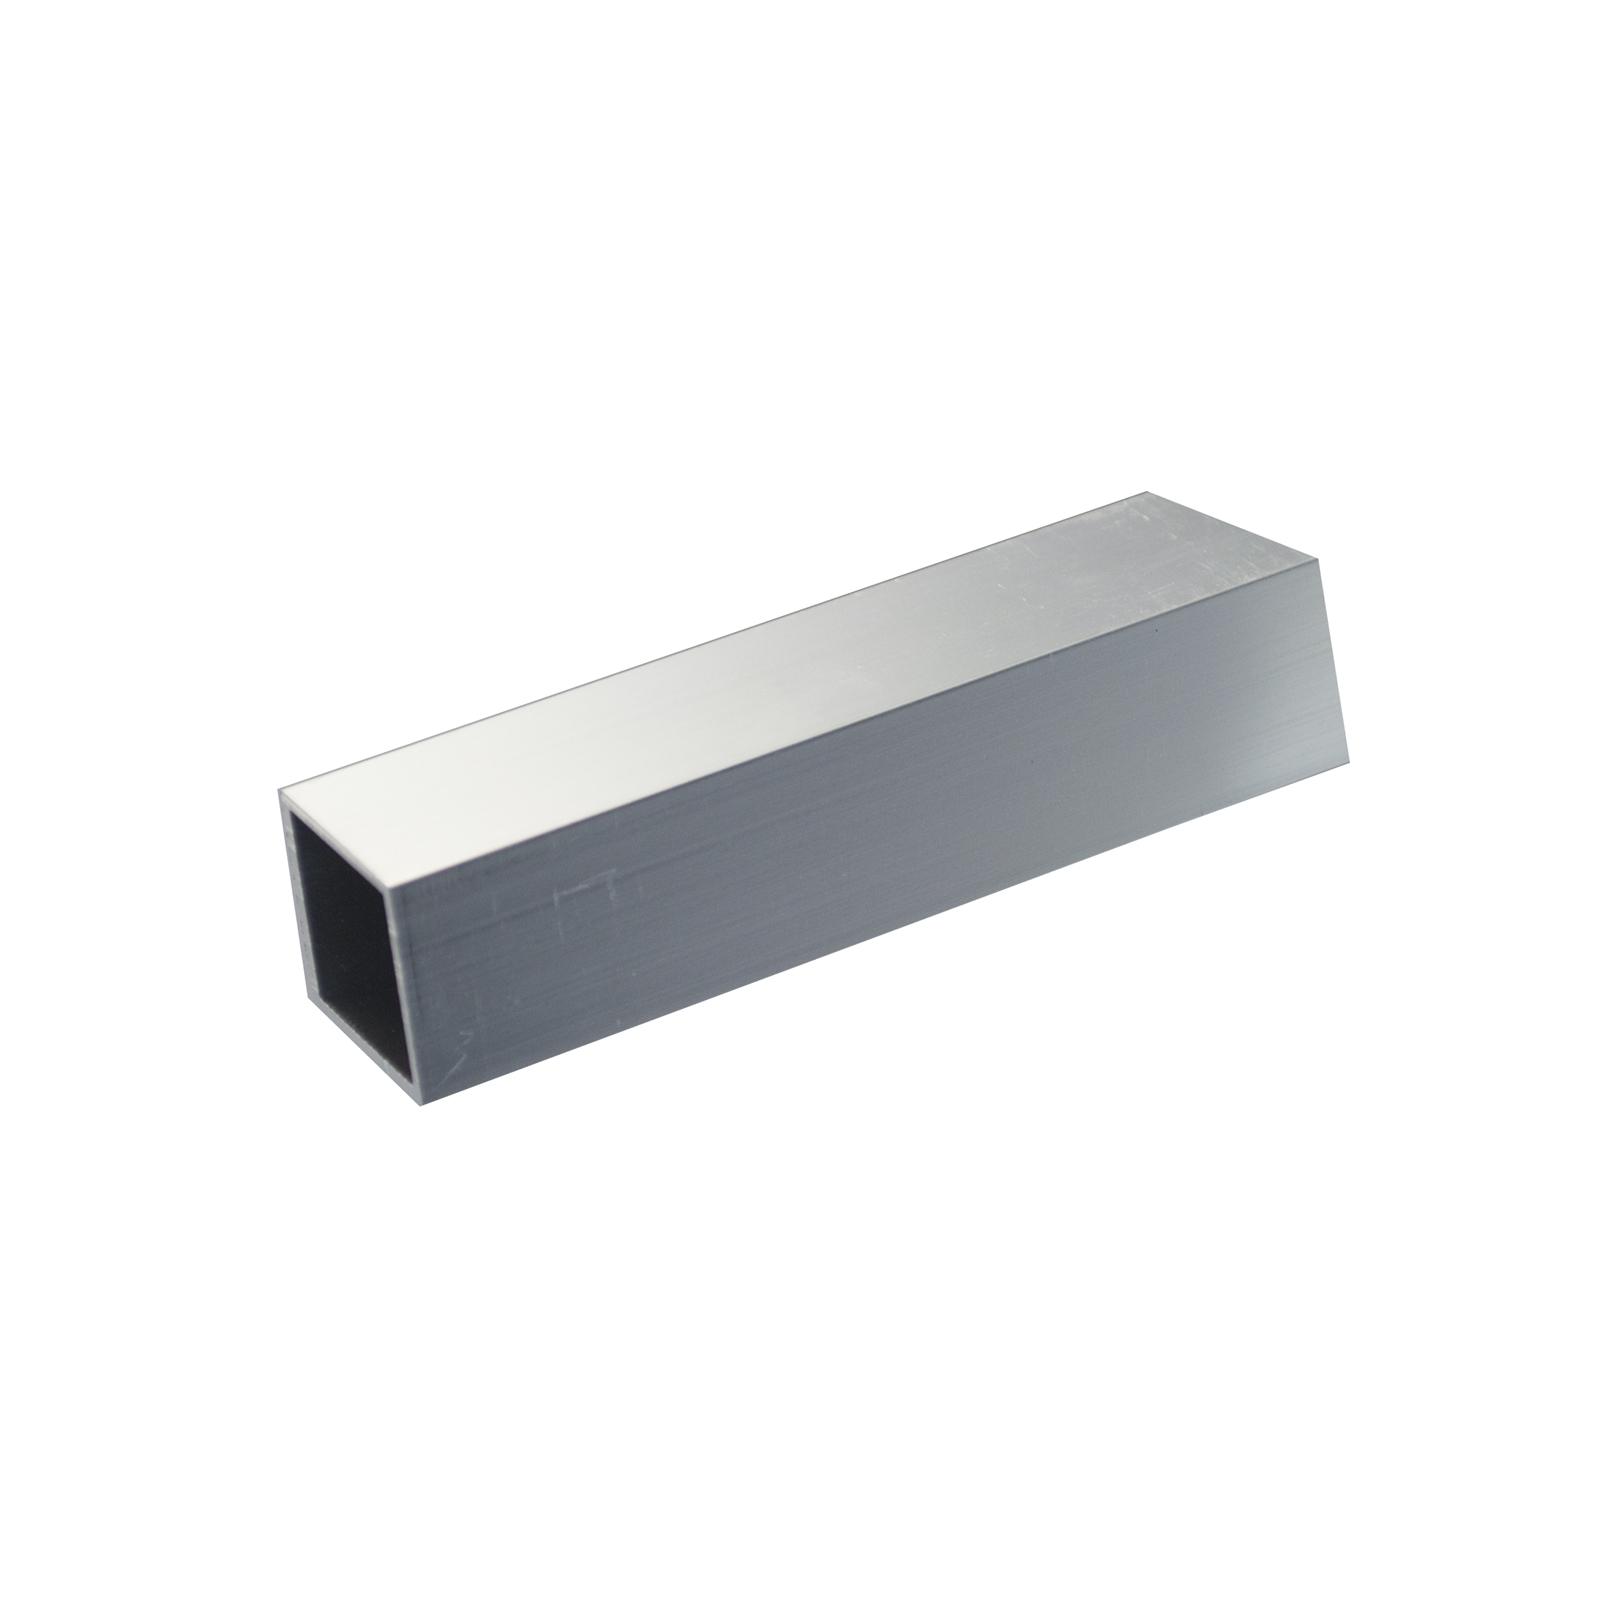 Metal Mate 25.4 x 25.4 x 1.2mm 1m Aluminium Square Box Tube